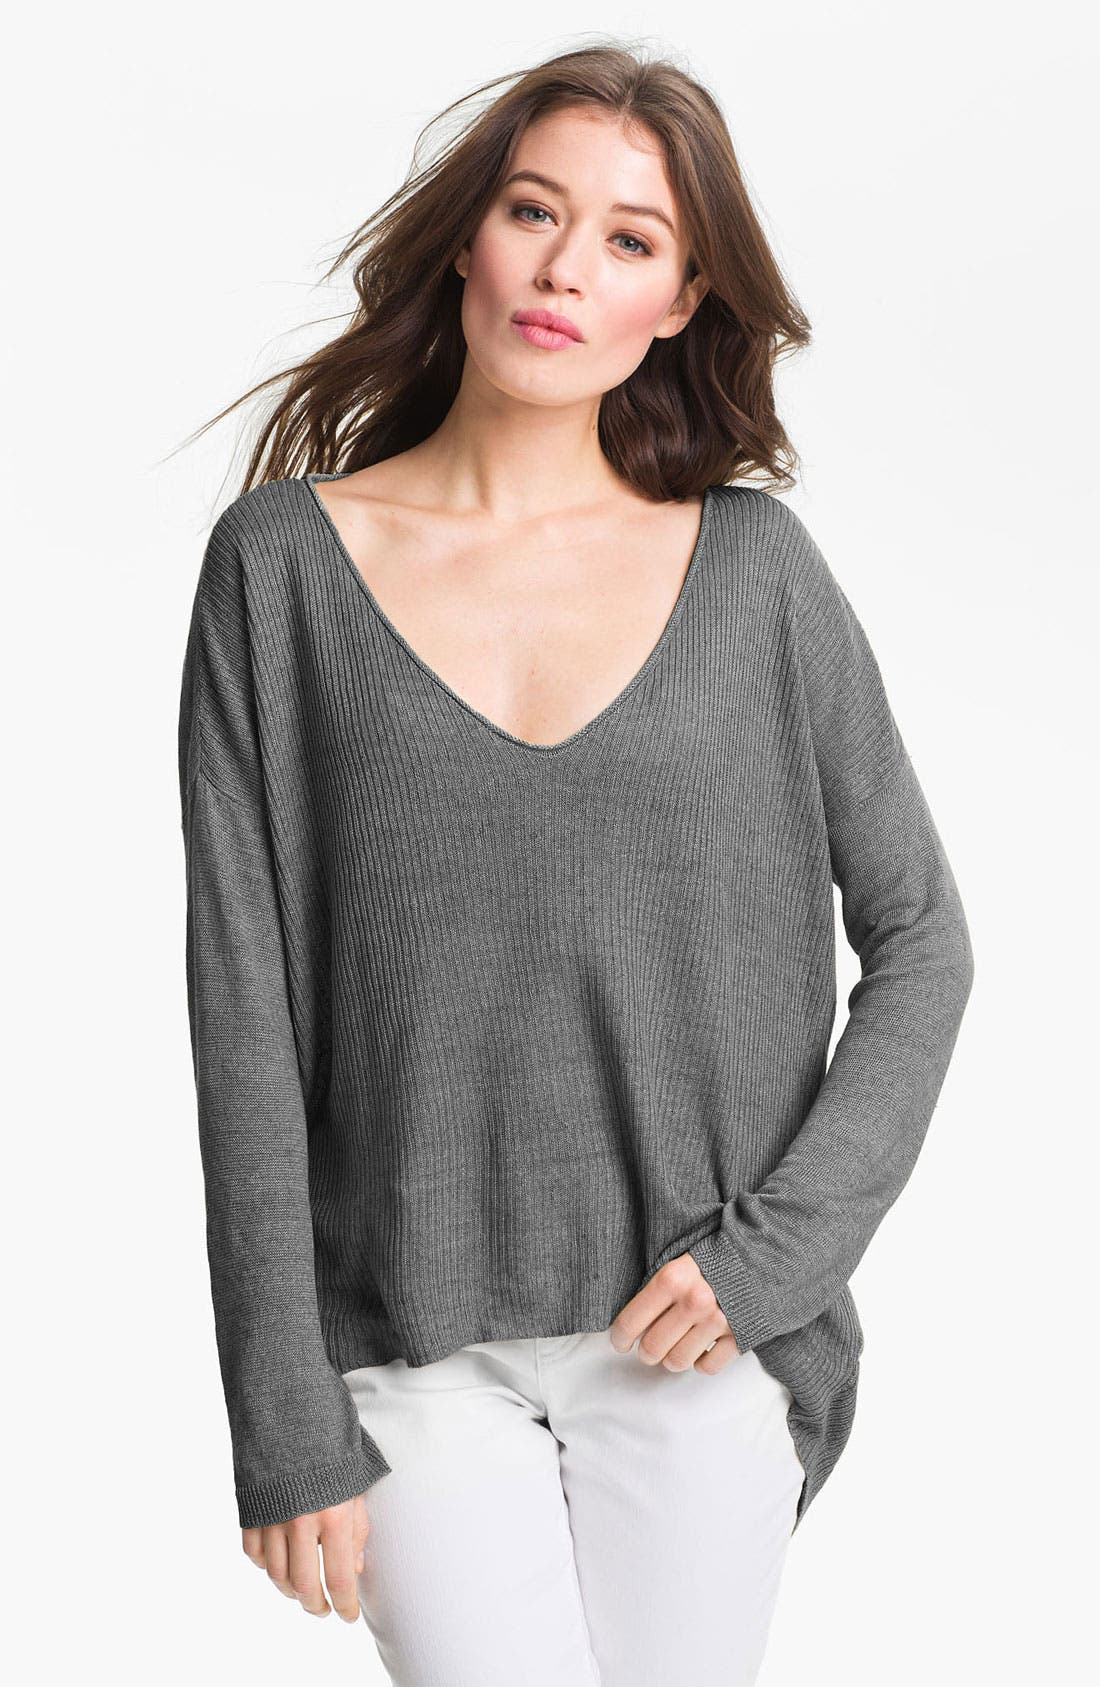 Alternate Image 1 Selected - Eileen Fisher 'Delave' Linen V-Neck Sweater (Online Only)